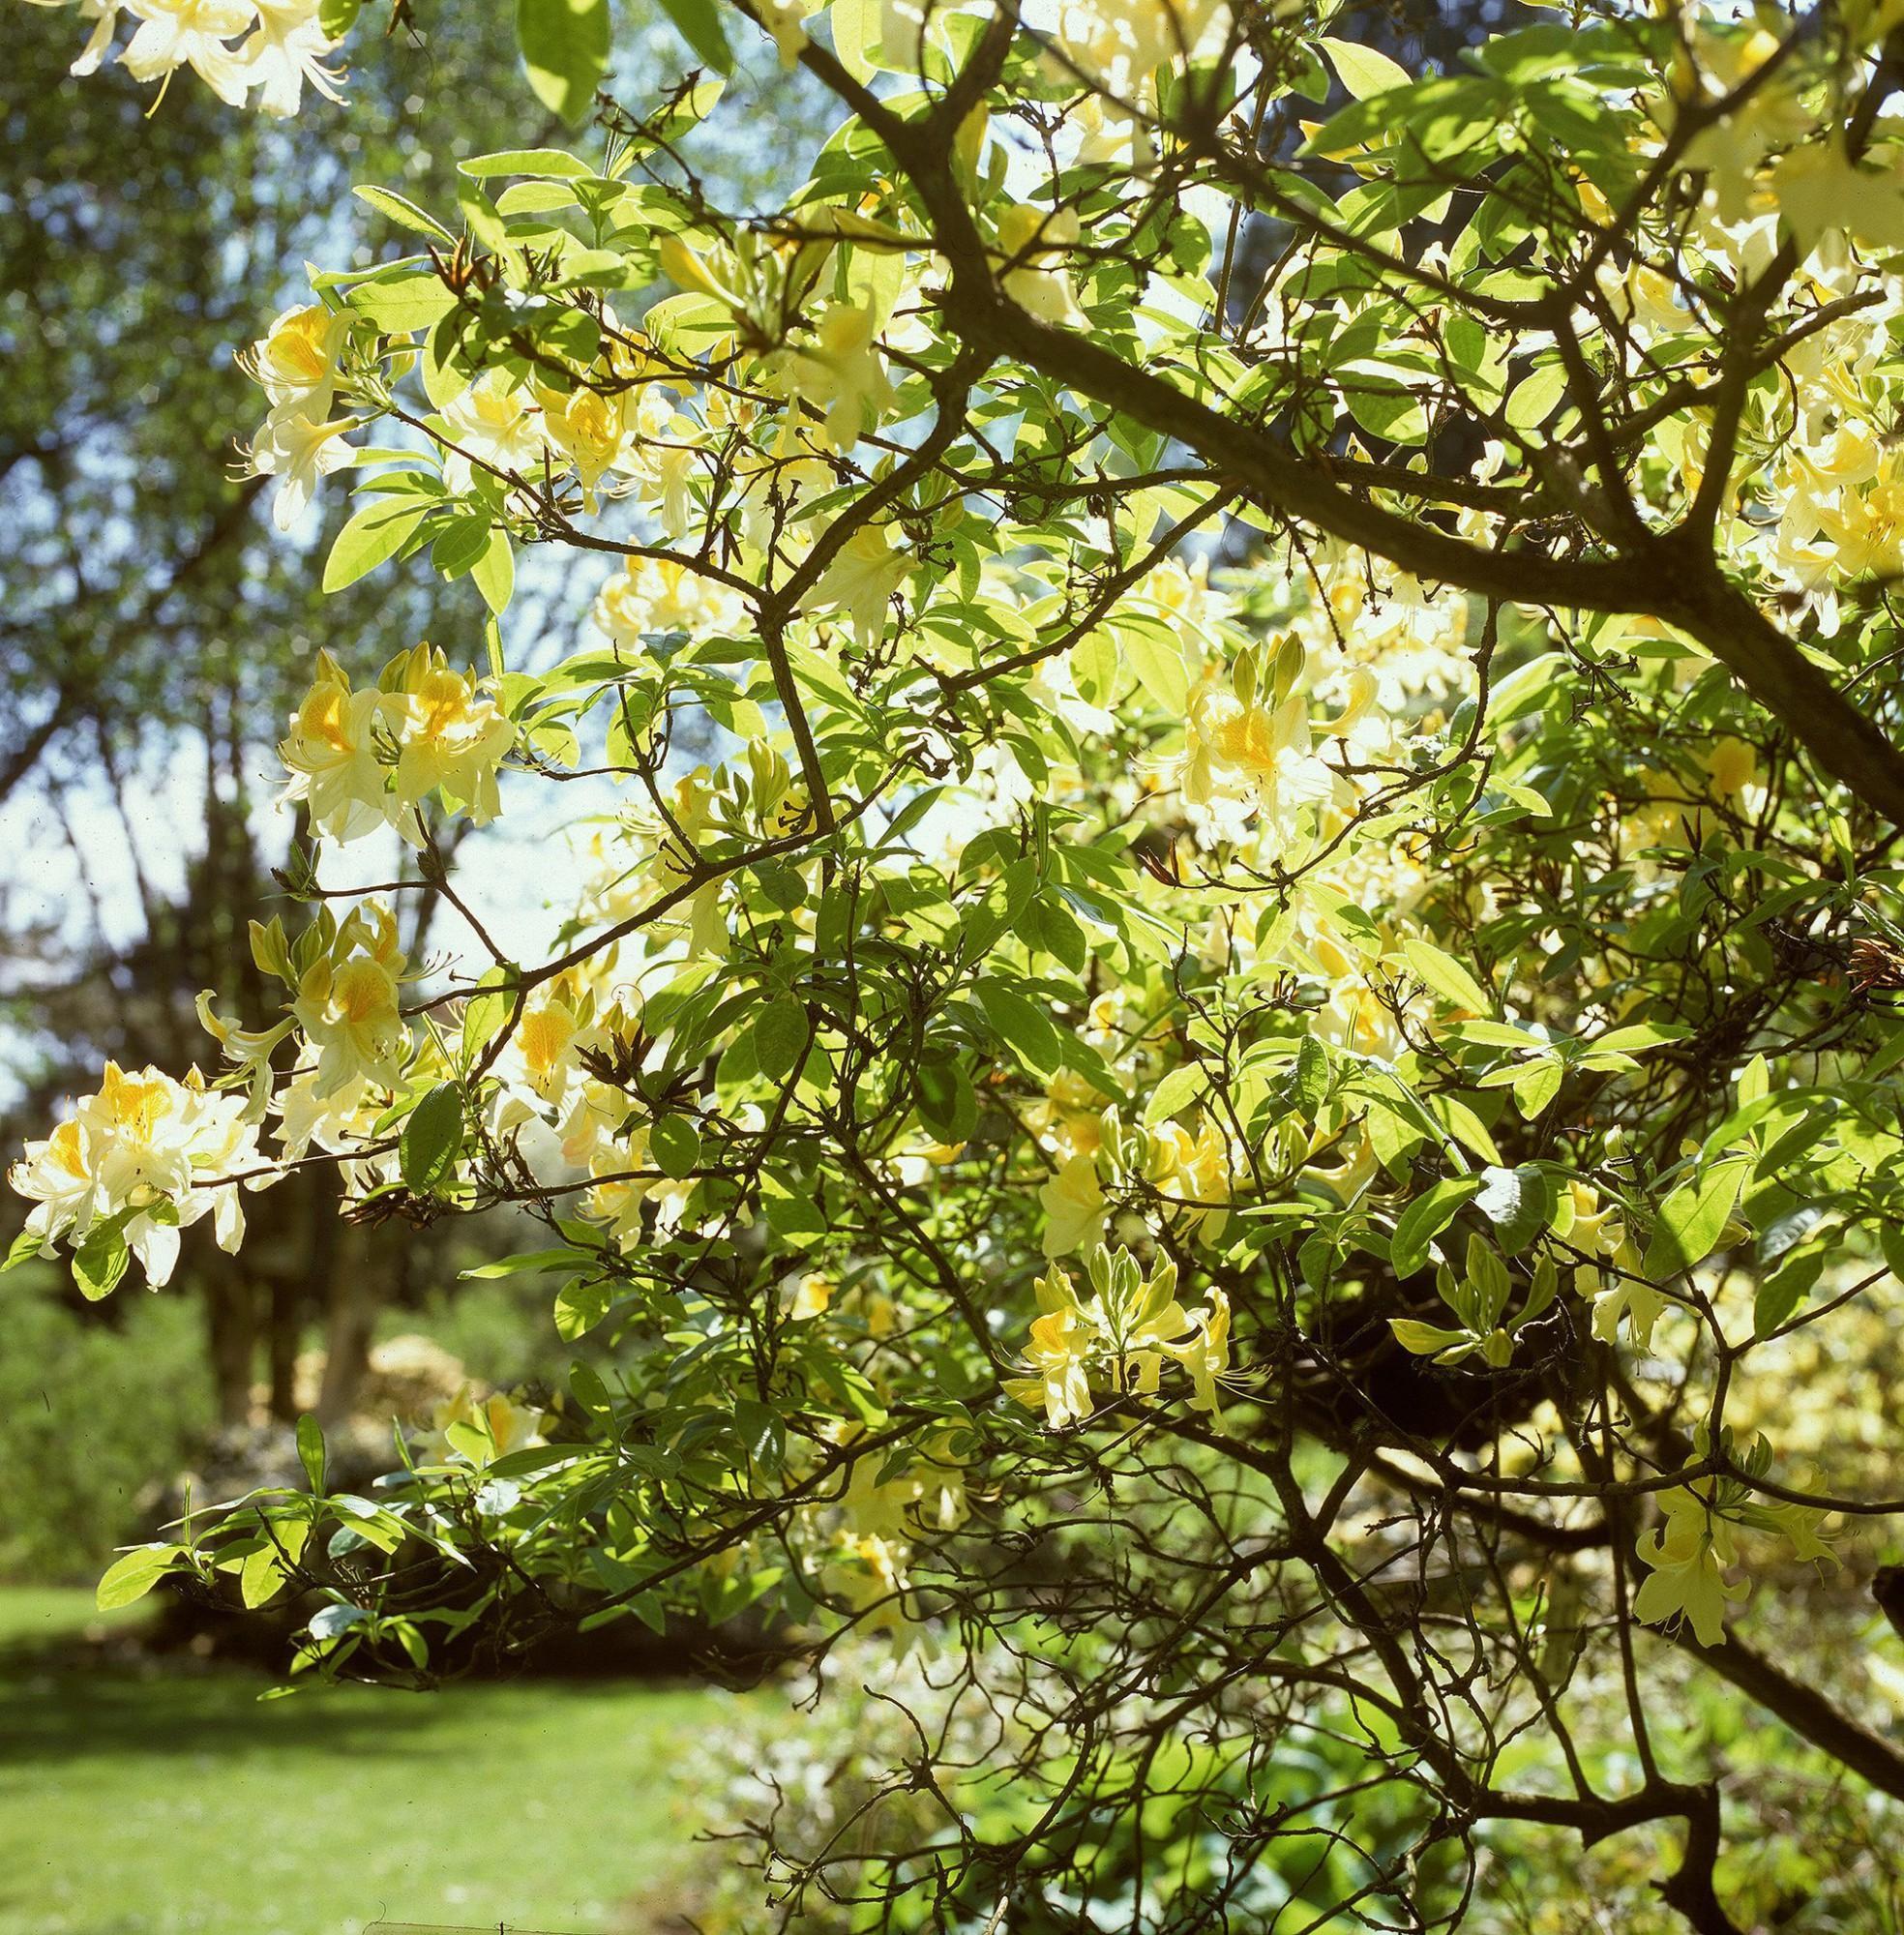 Afbeelding: Fotografie tuinarchitectuur, fotografie bloemen en planten, bomen en struiken. Bloeiende azalea.